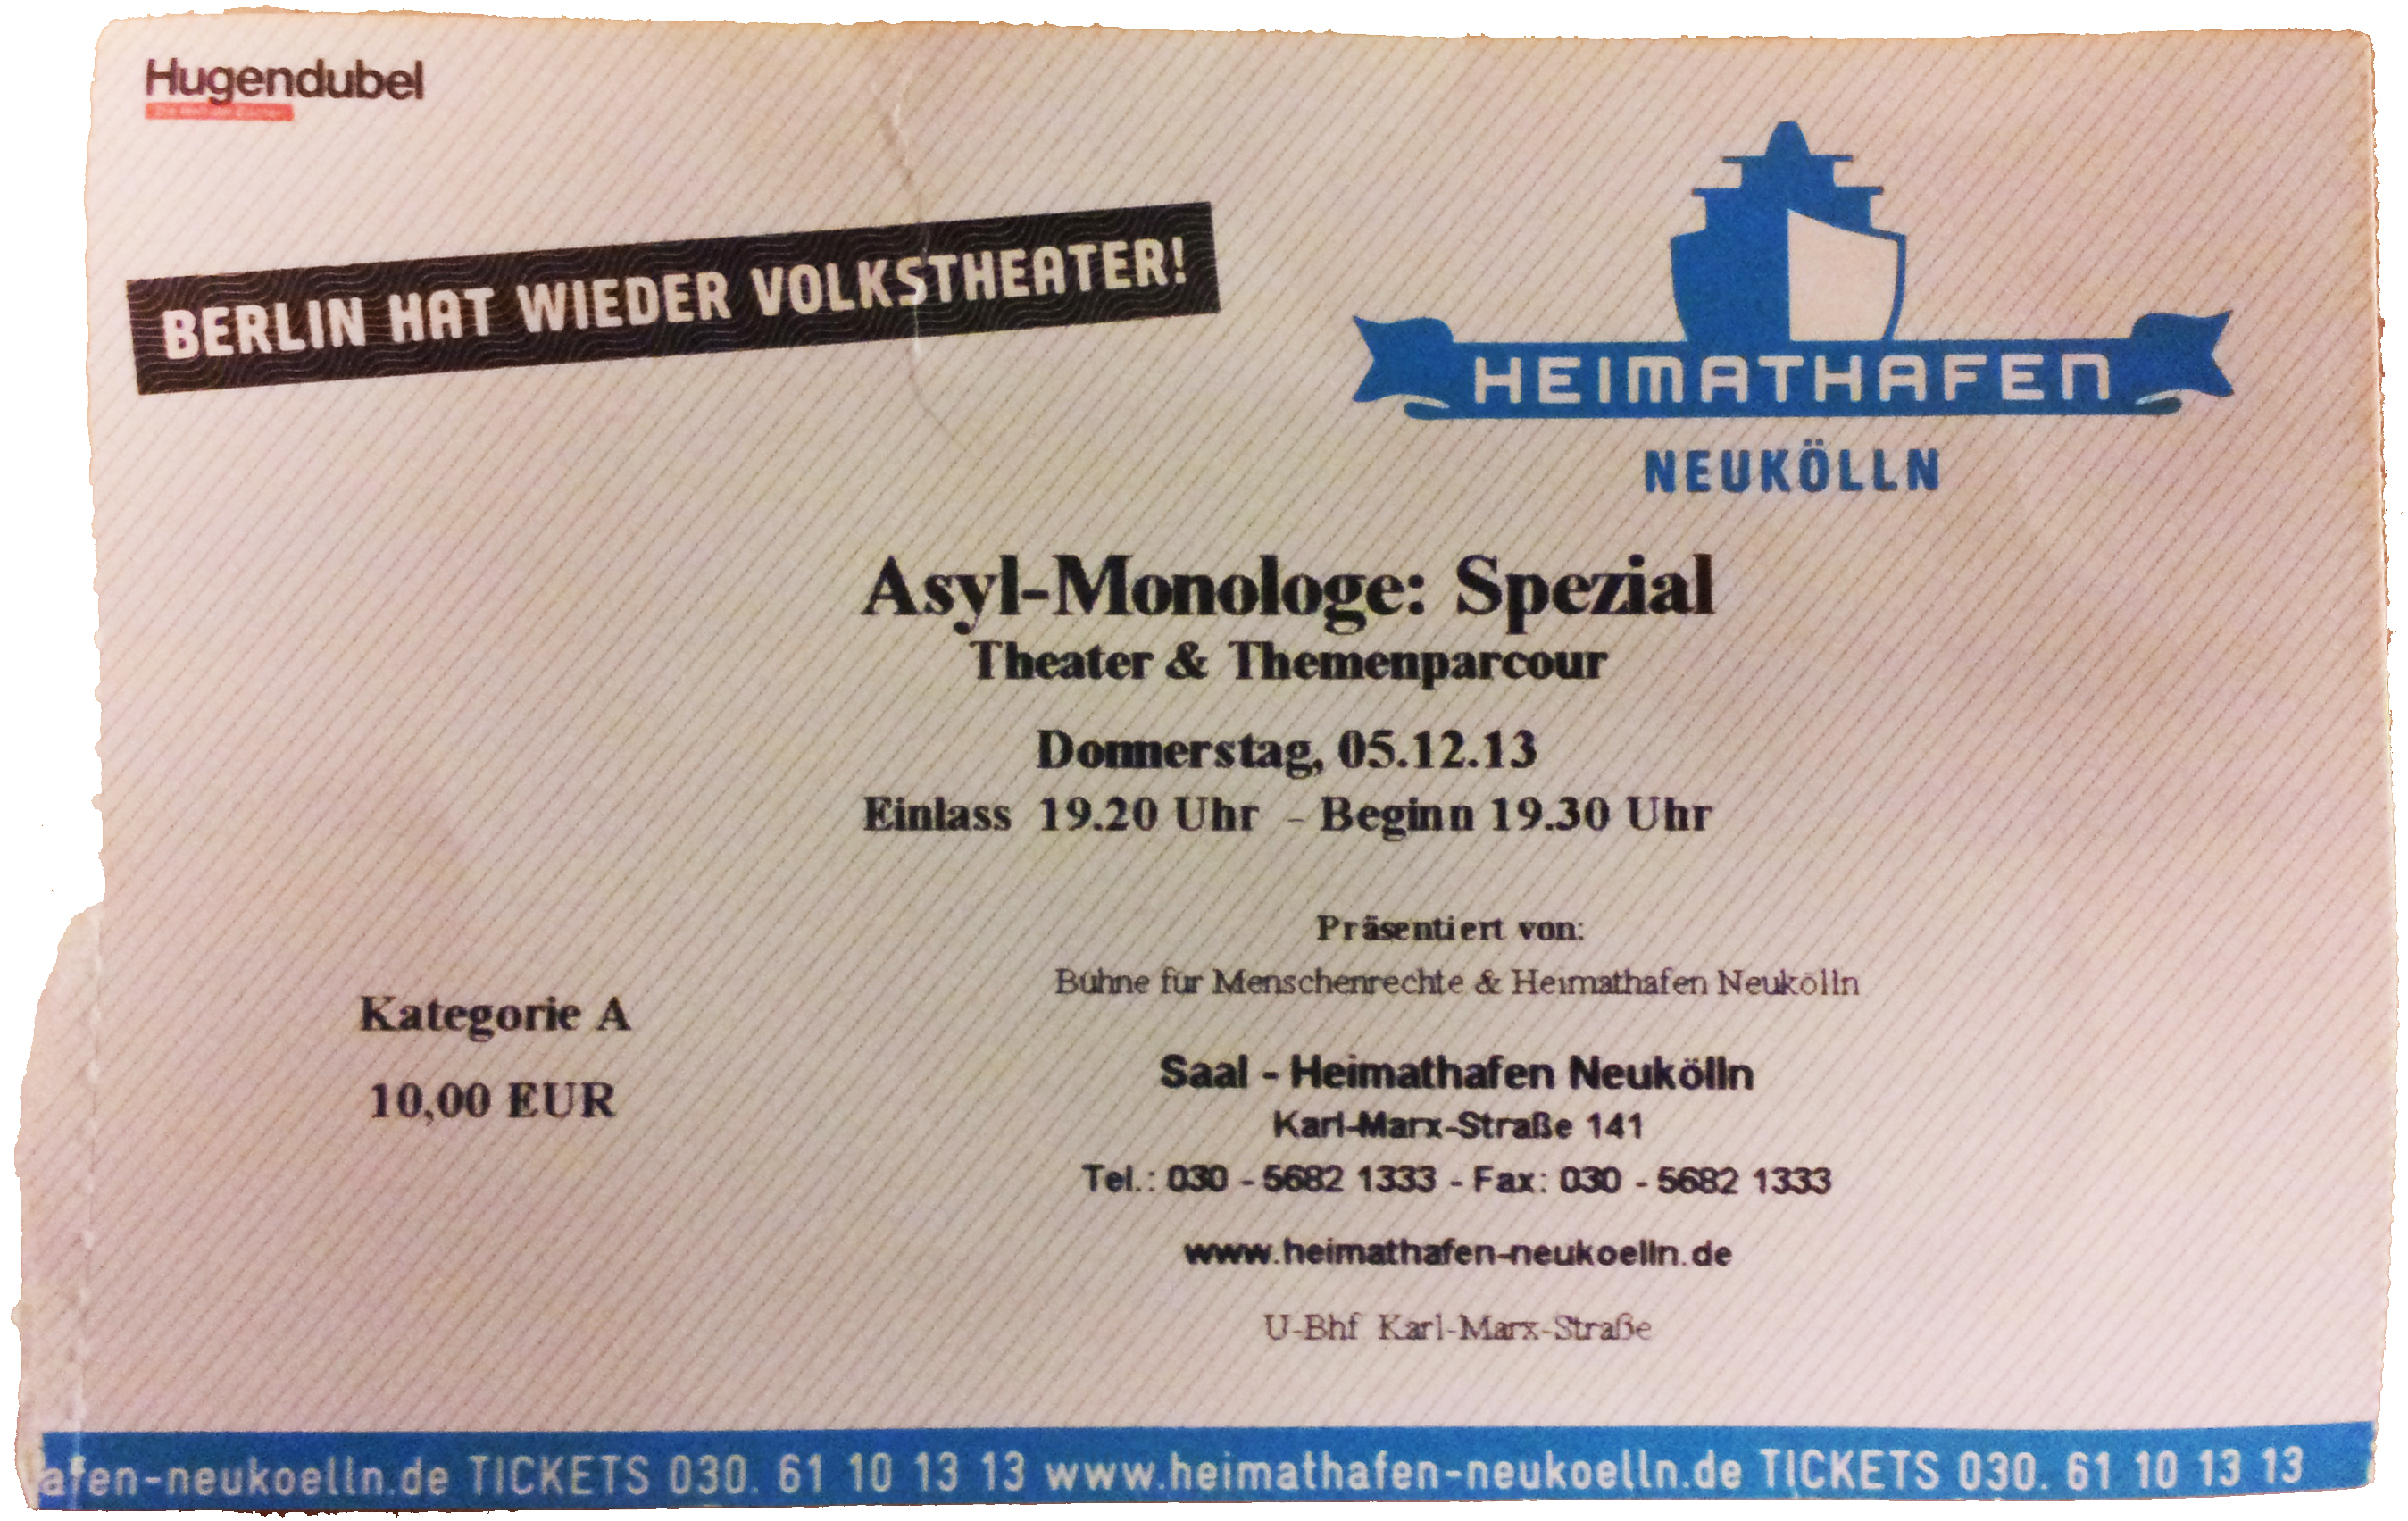 Asyl-Monologe